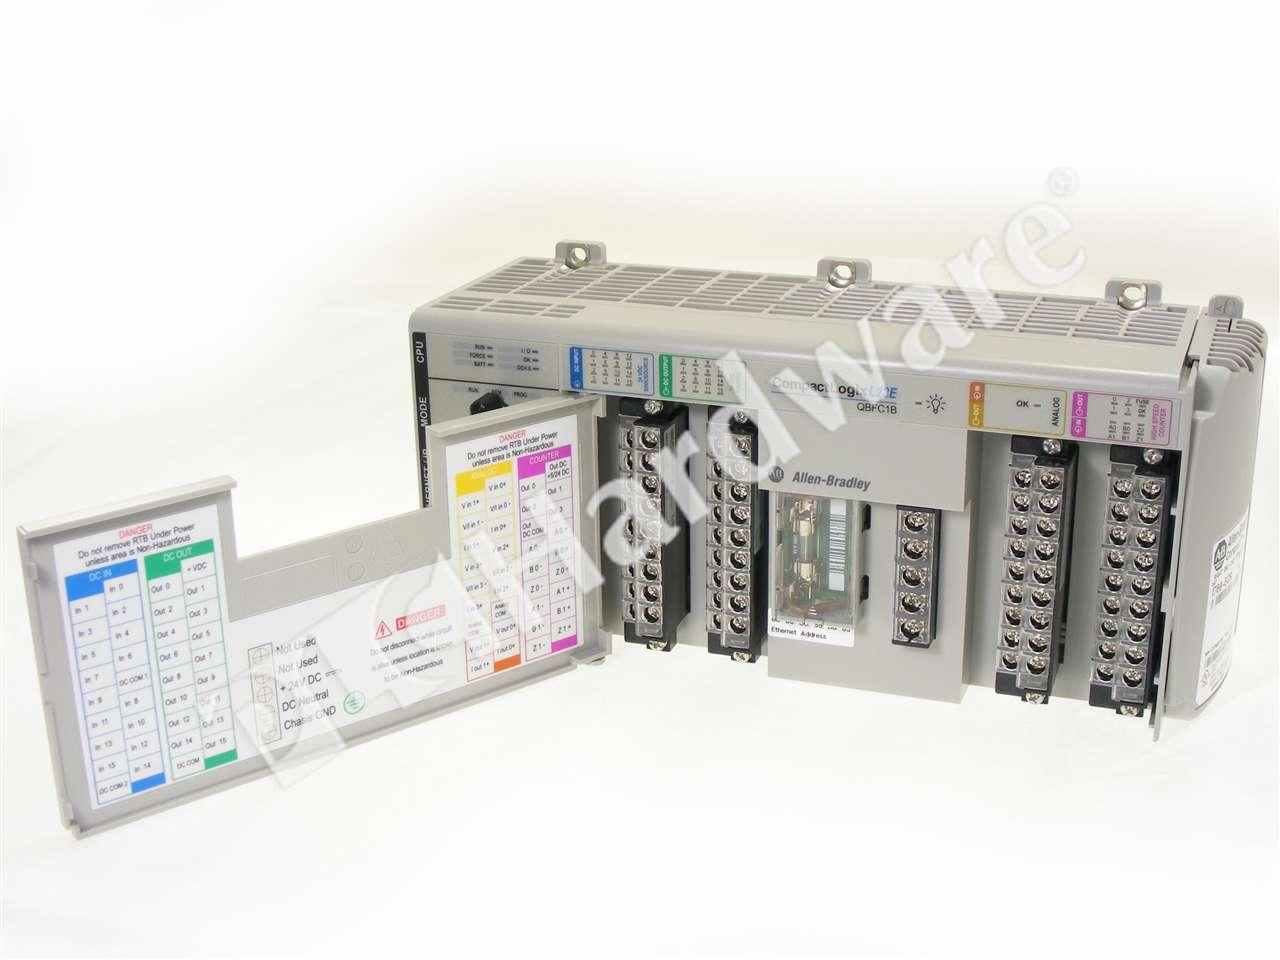 plc hardware allen bradley 1769 l23e qbfc1b compactlogix ethernet rh plchardware com Owner's Manual Manuals in PDF